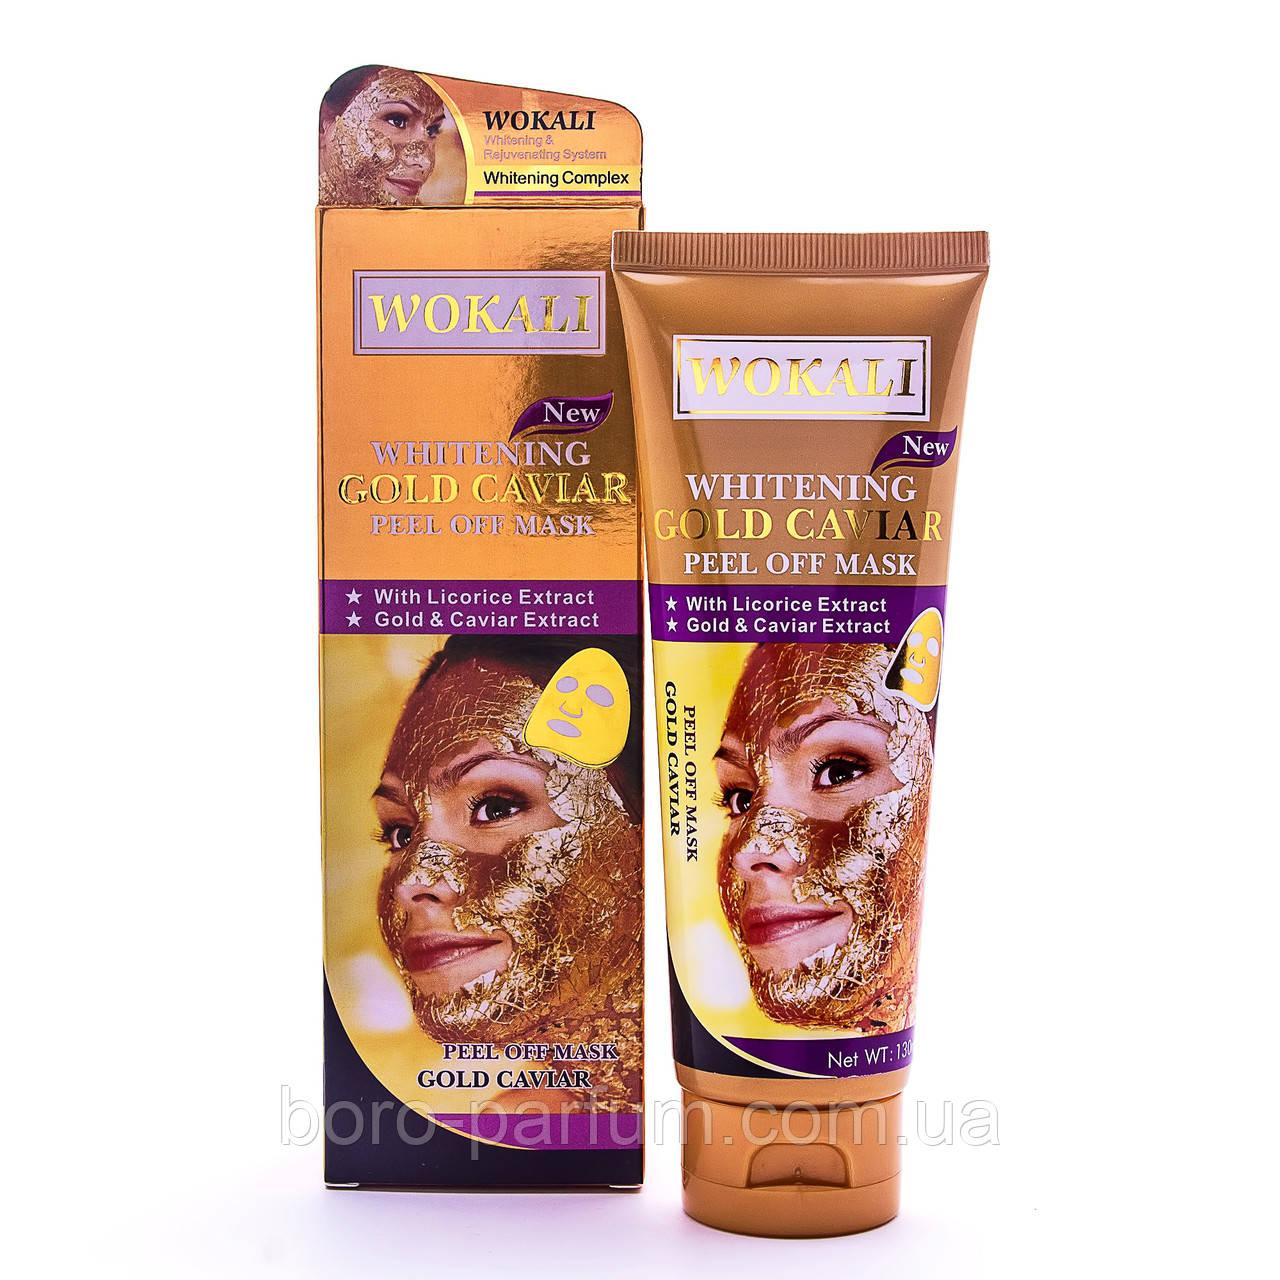 Золотая маска для лица  Wokali Gold Caviar